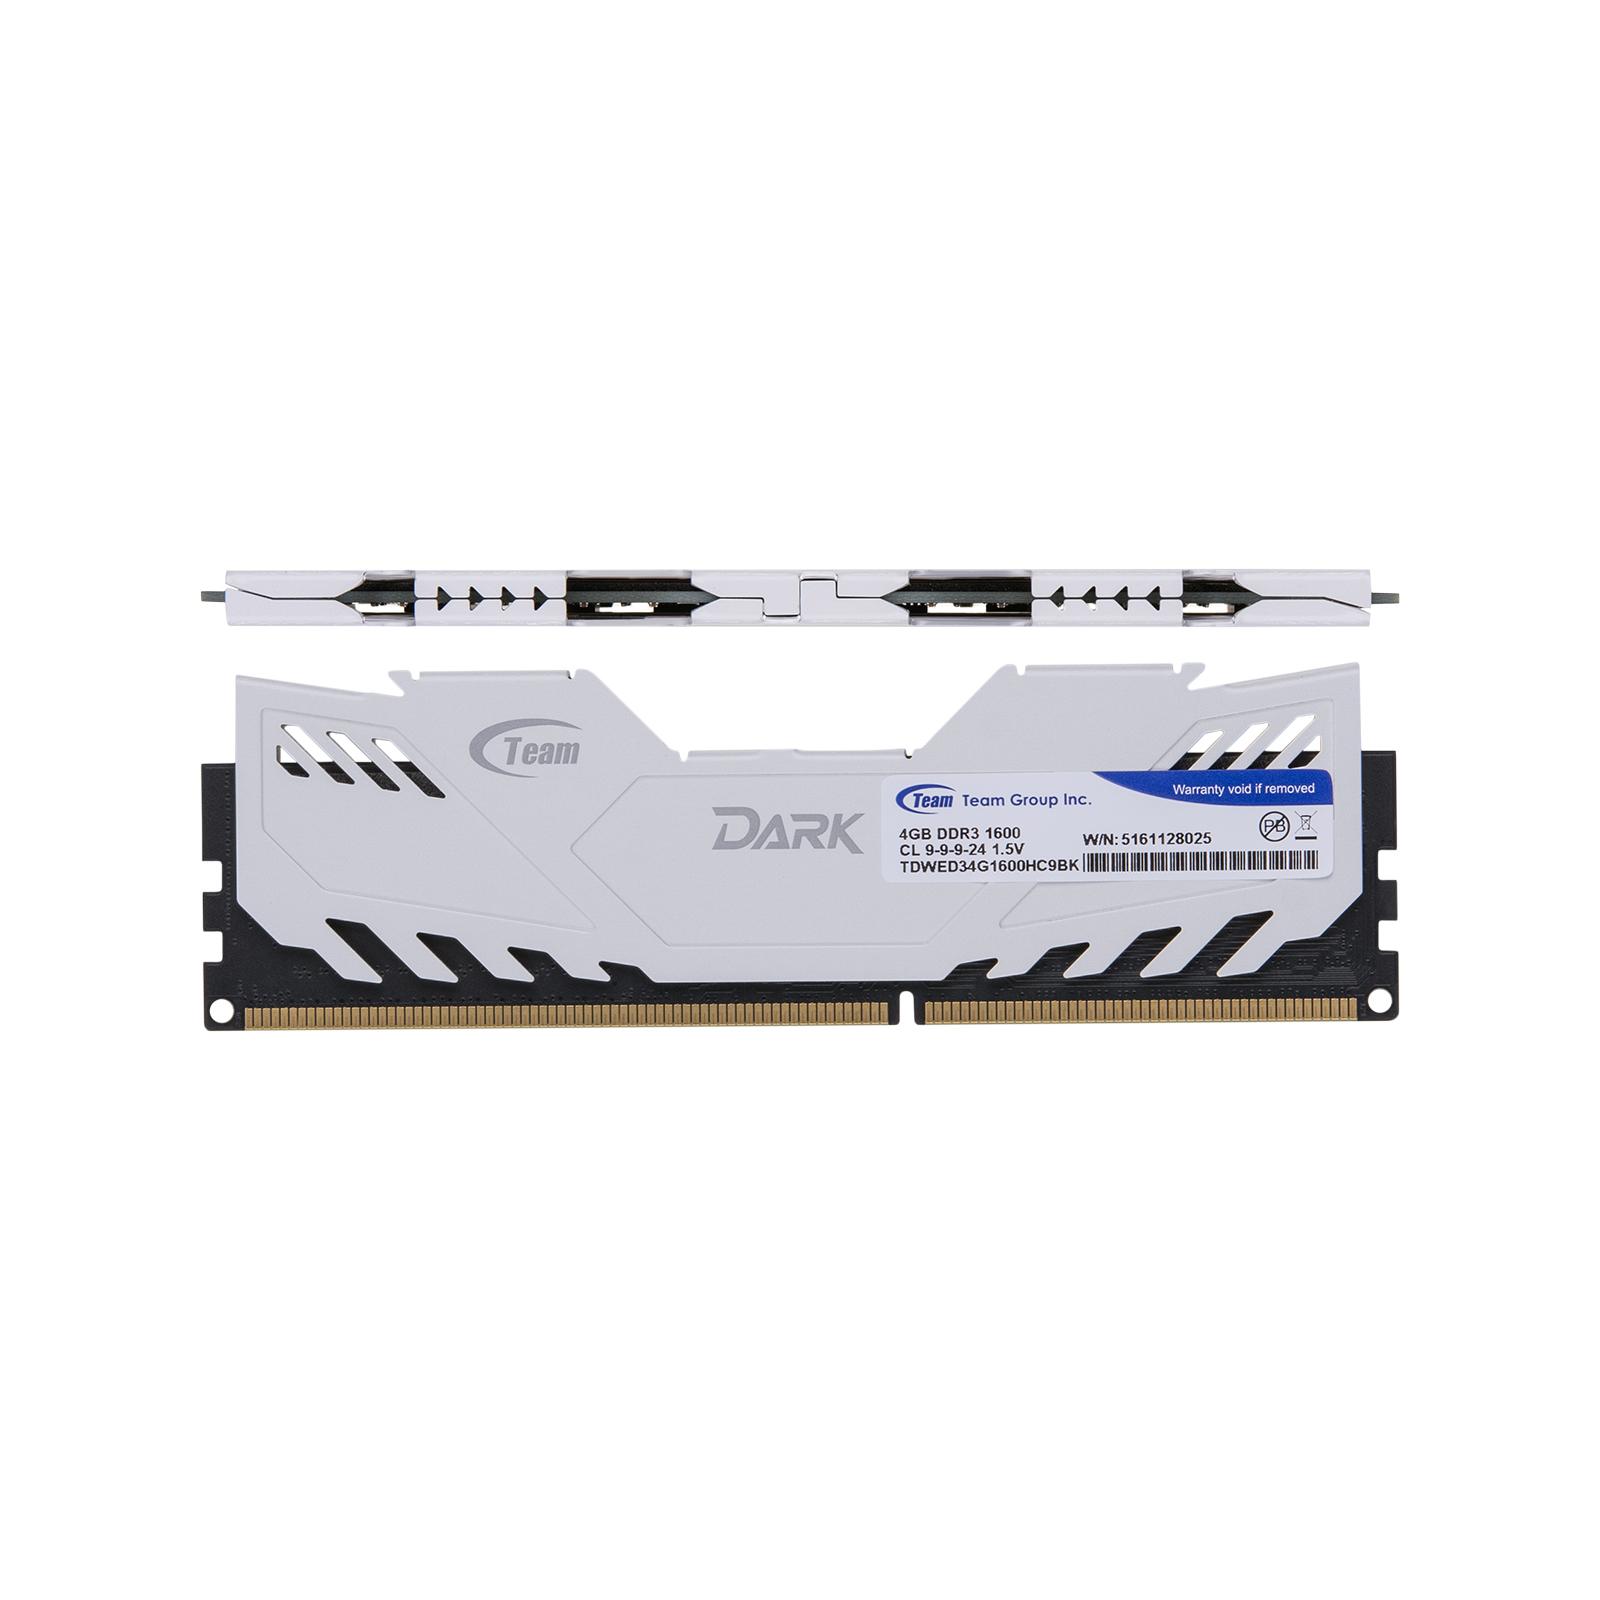 Модуль памяти для компьютера DDR3 4GB 1600 MHz Dark Series White Team (TDWED34G1600HC901) изображение 2